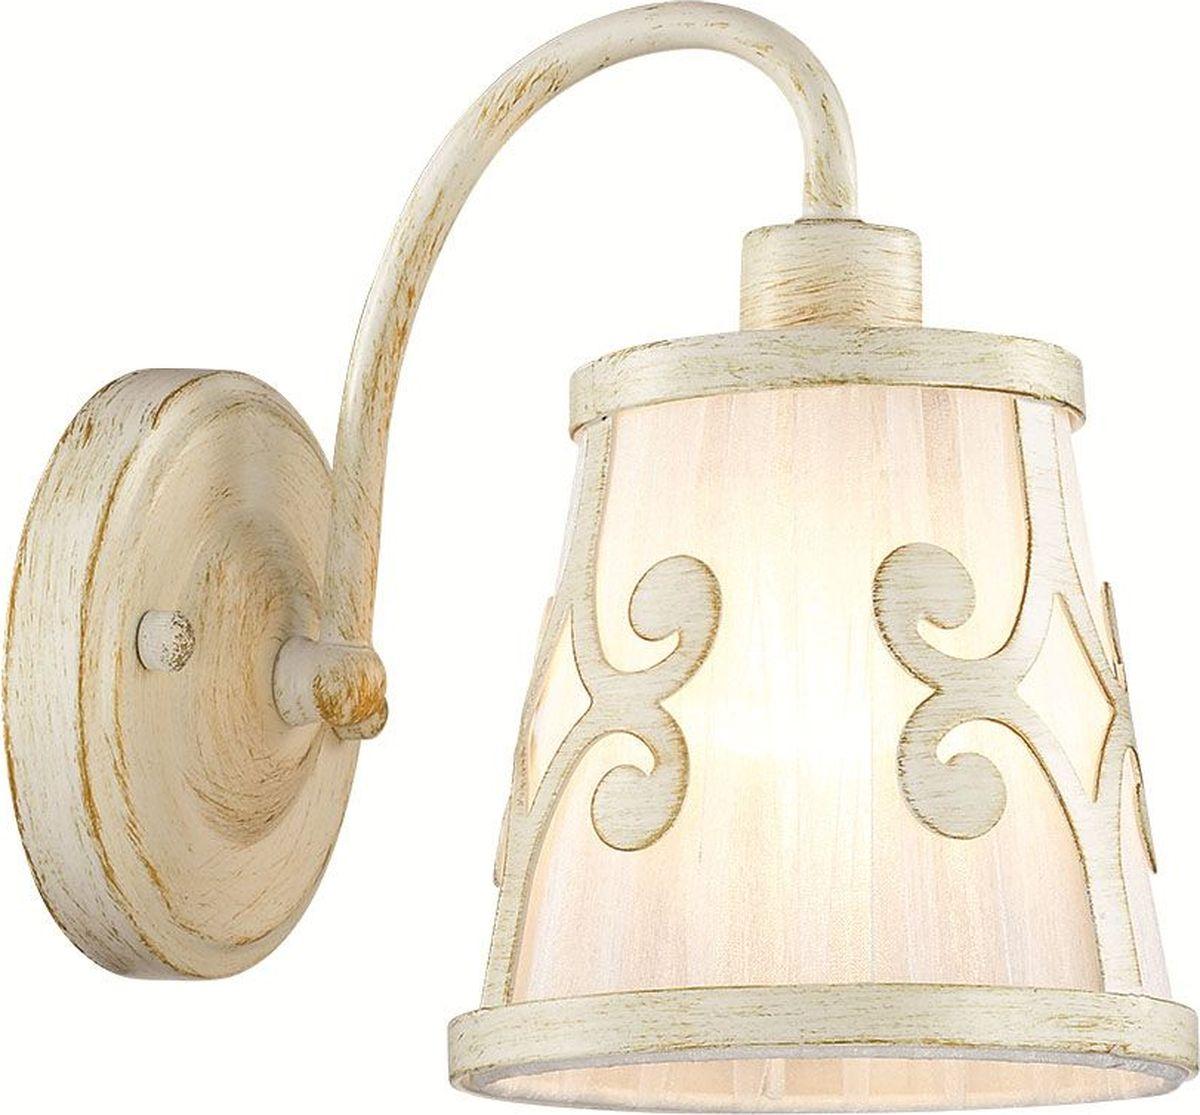 Бра Lumion Fetida White, цвет: белый, E14, 60 Вт. 3129/1W3129/1W